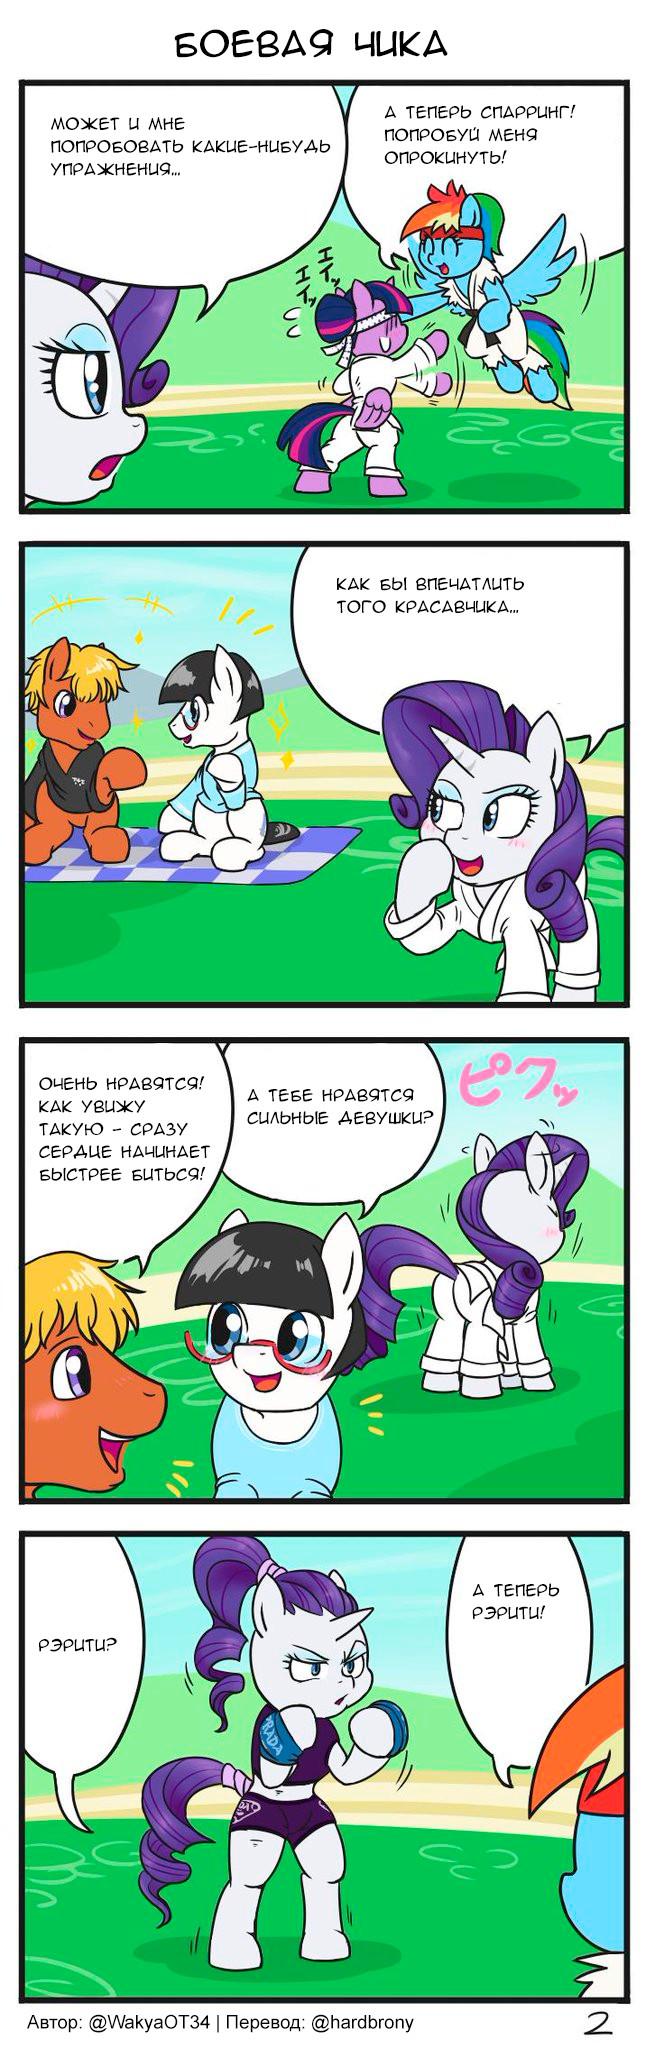 Понячьих комиксов маленькая пачка ч.2 My Little Pony, Rarity, Original Character, Карате, Додзинси, Rainbow Dash, Twilight Sparkle, Hardbrony, Длиннопост